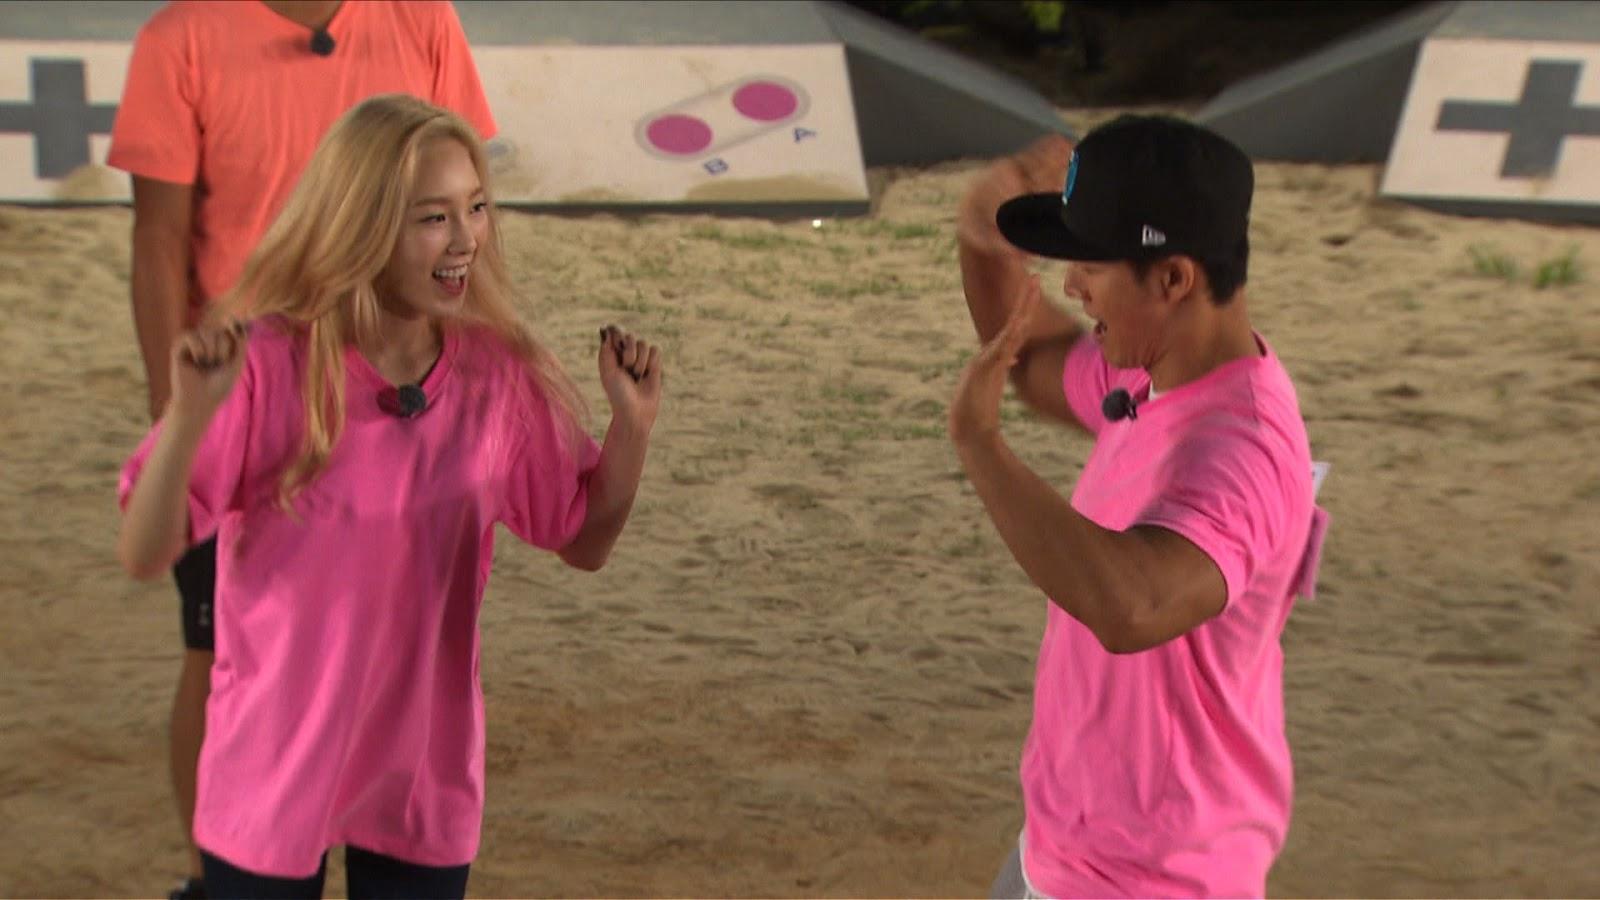 SNSD Overload: Girls' Generation's on Running Man, Guerilla Date